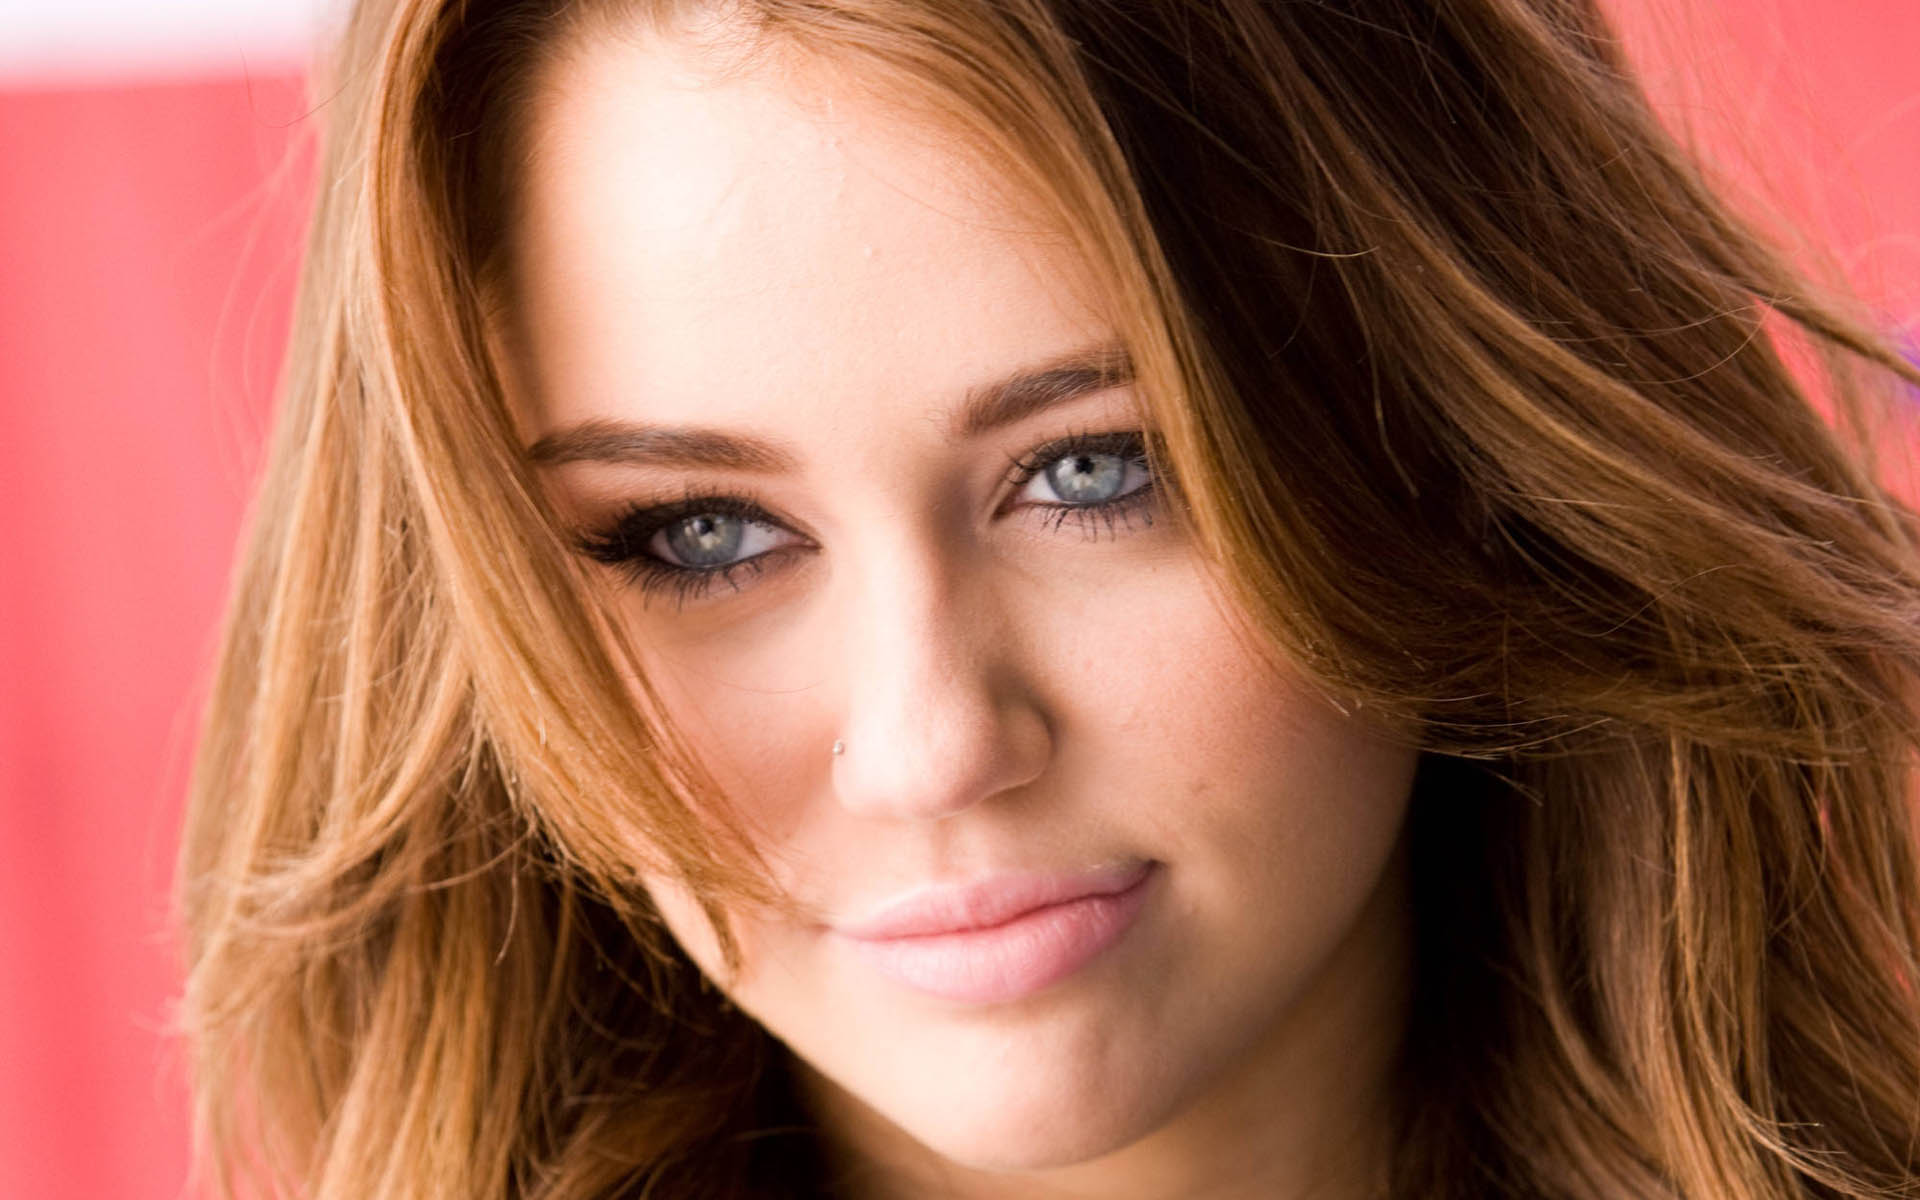 Katrina Kaif Cute Face Hd Wallpapers Miley Cyrus Wallpapers Movie Hd Wallpapers